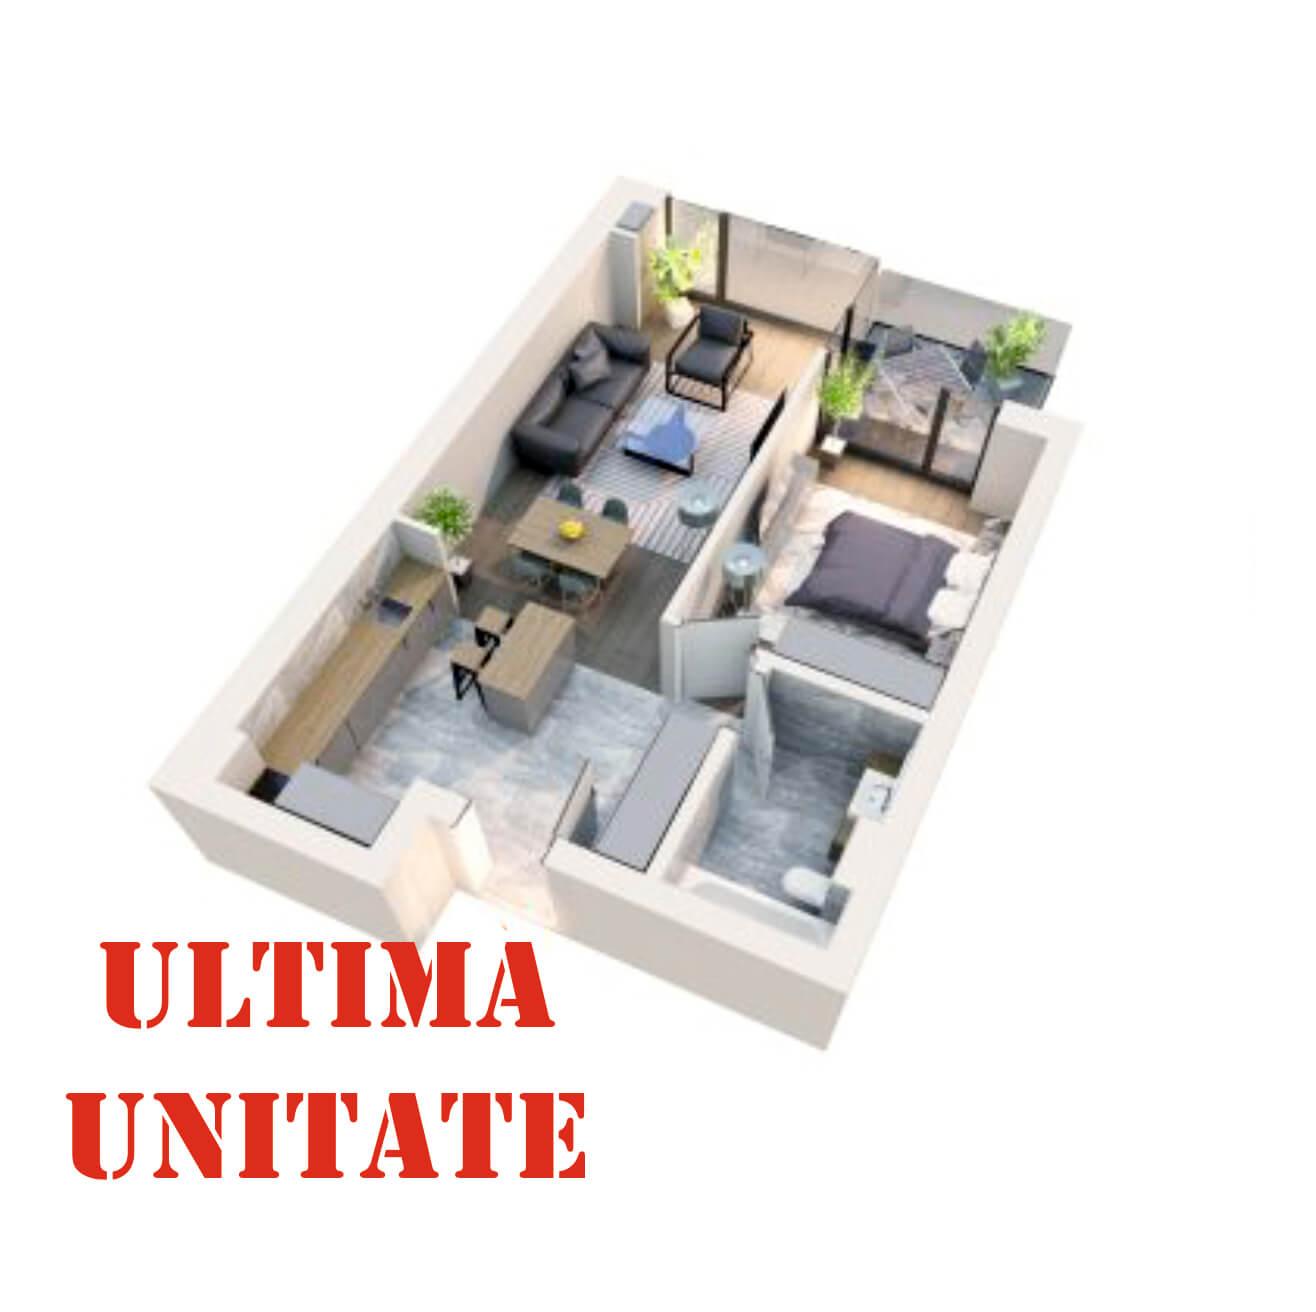 "Apartament 2 camere tip 2D2"" Logie | Etaj 5-6 | Corp C7 | Faza 2"